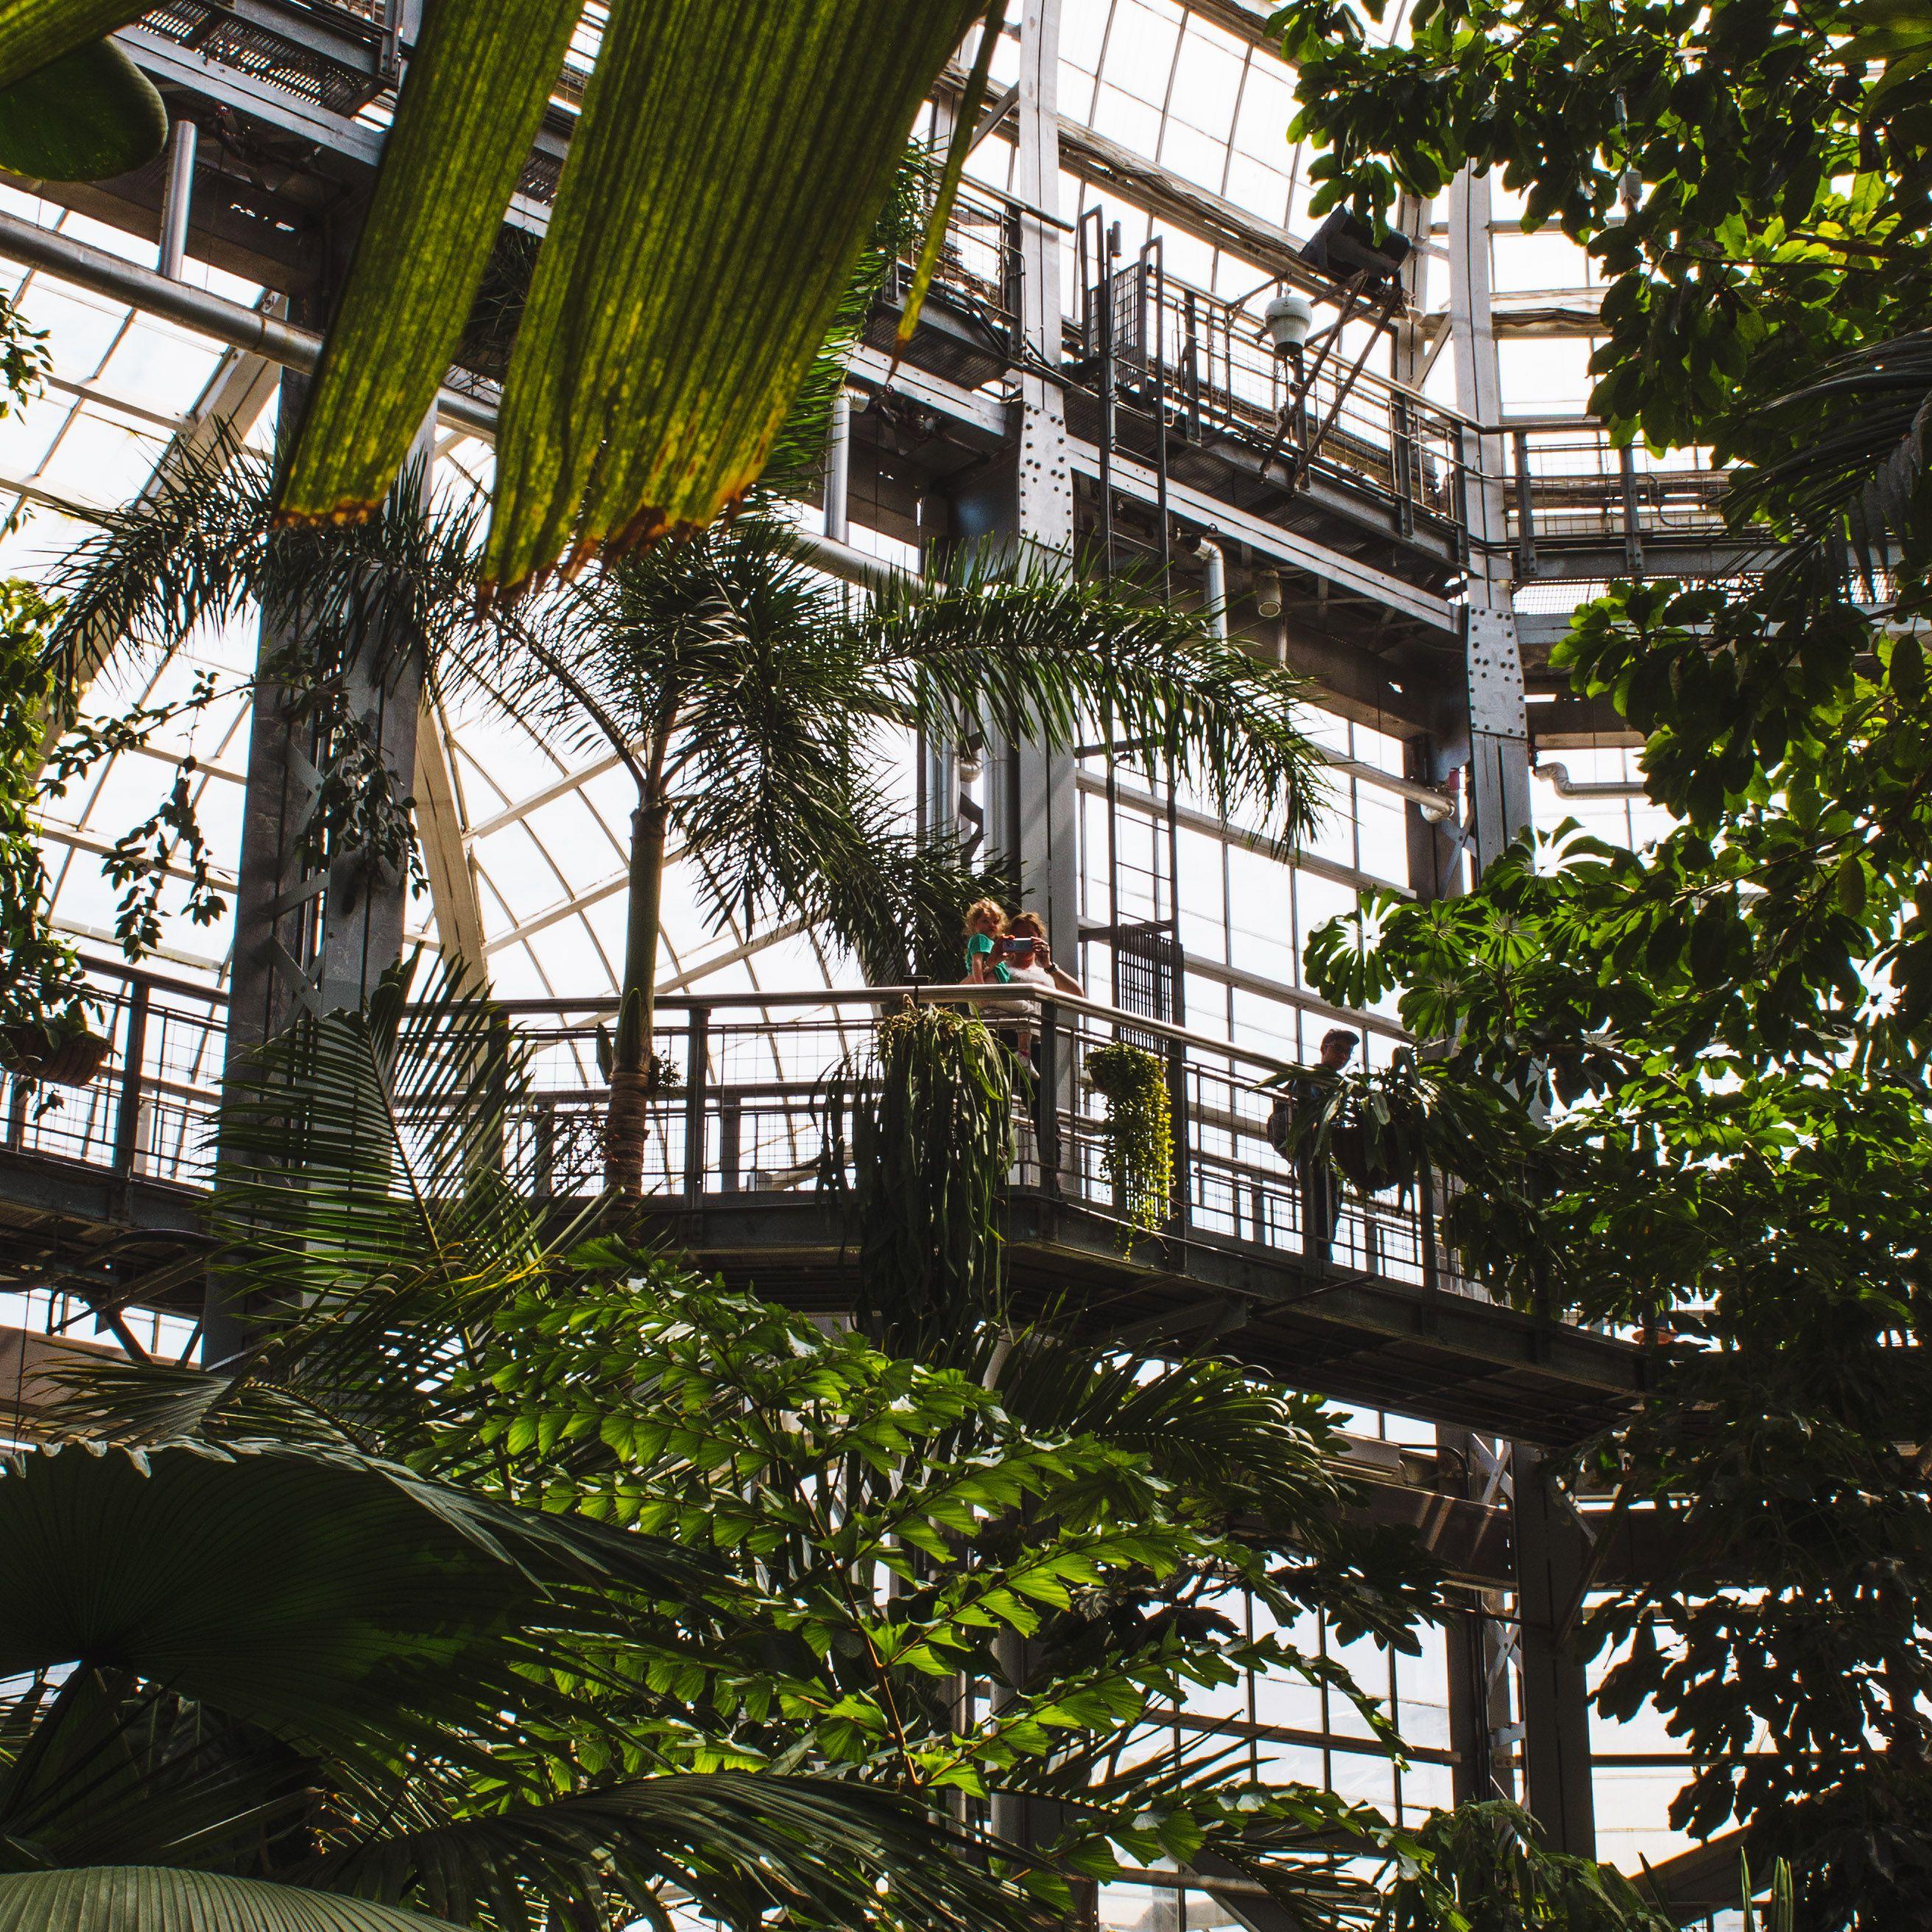 The National Botanical Garden